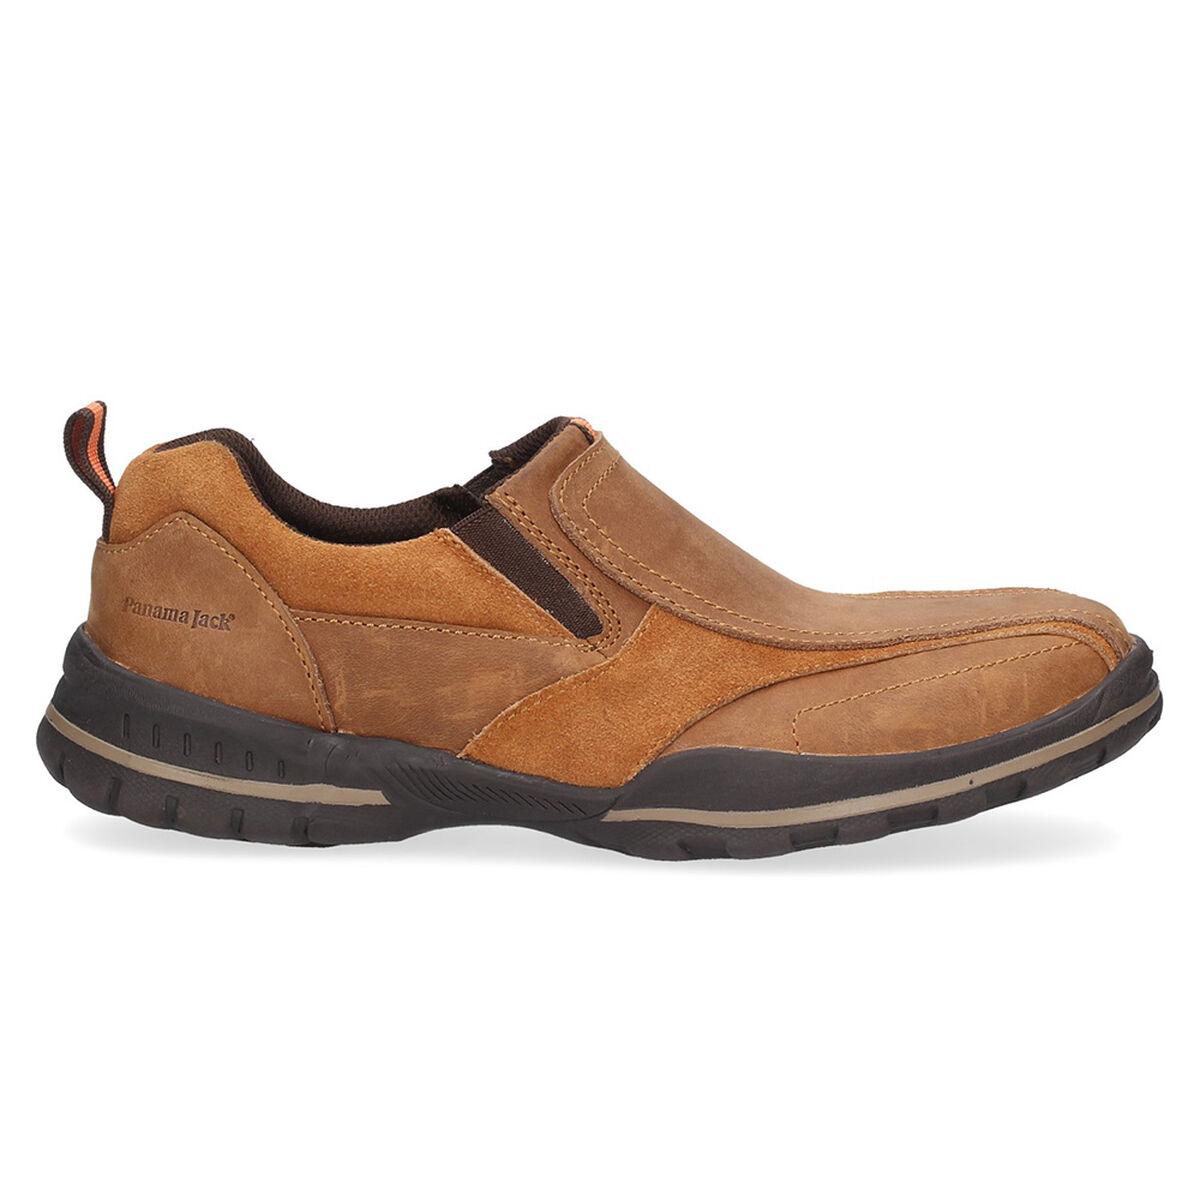 Zapato Sport Panama Jack Hombre